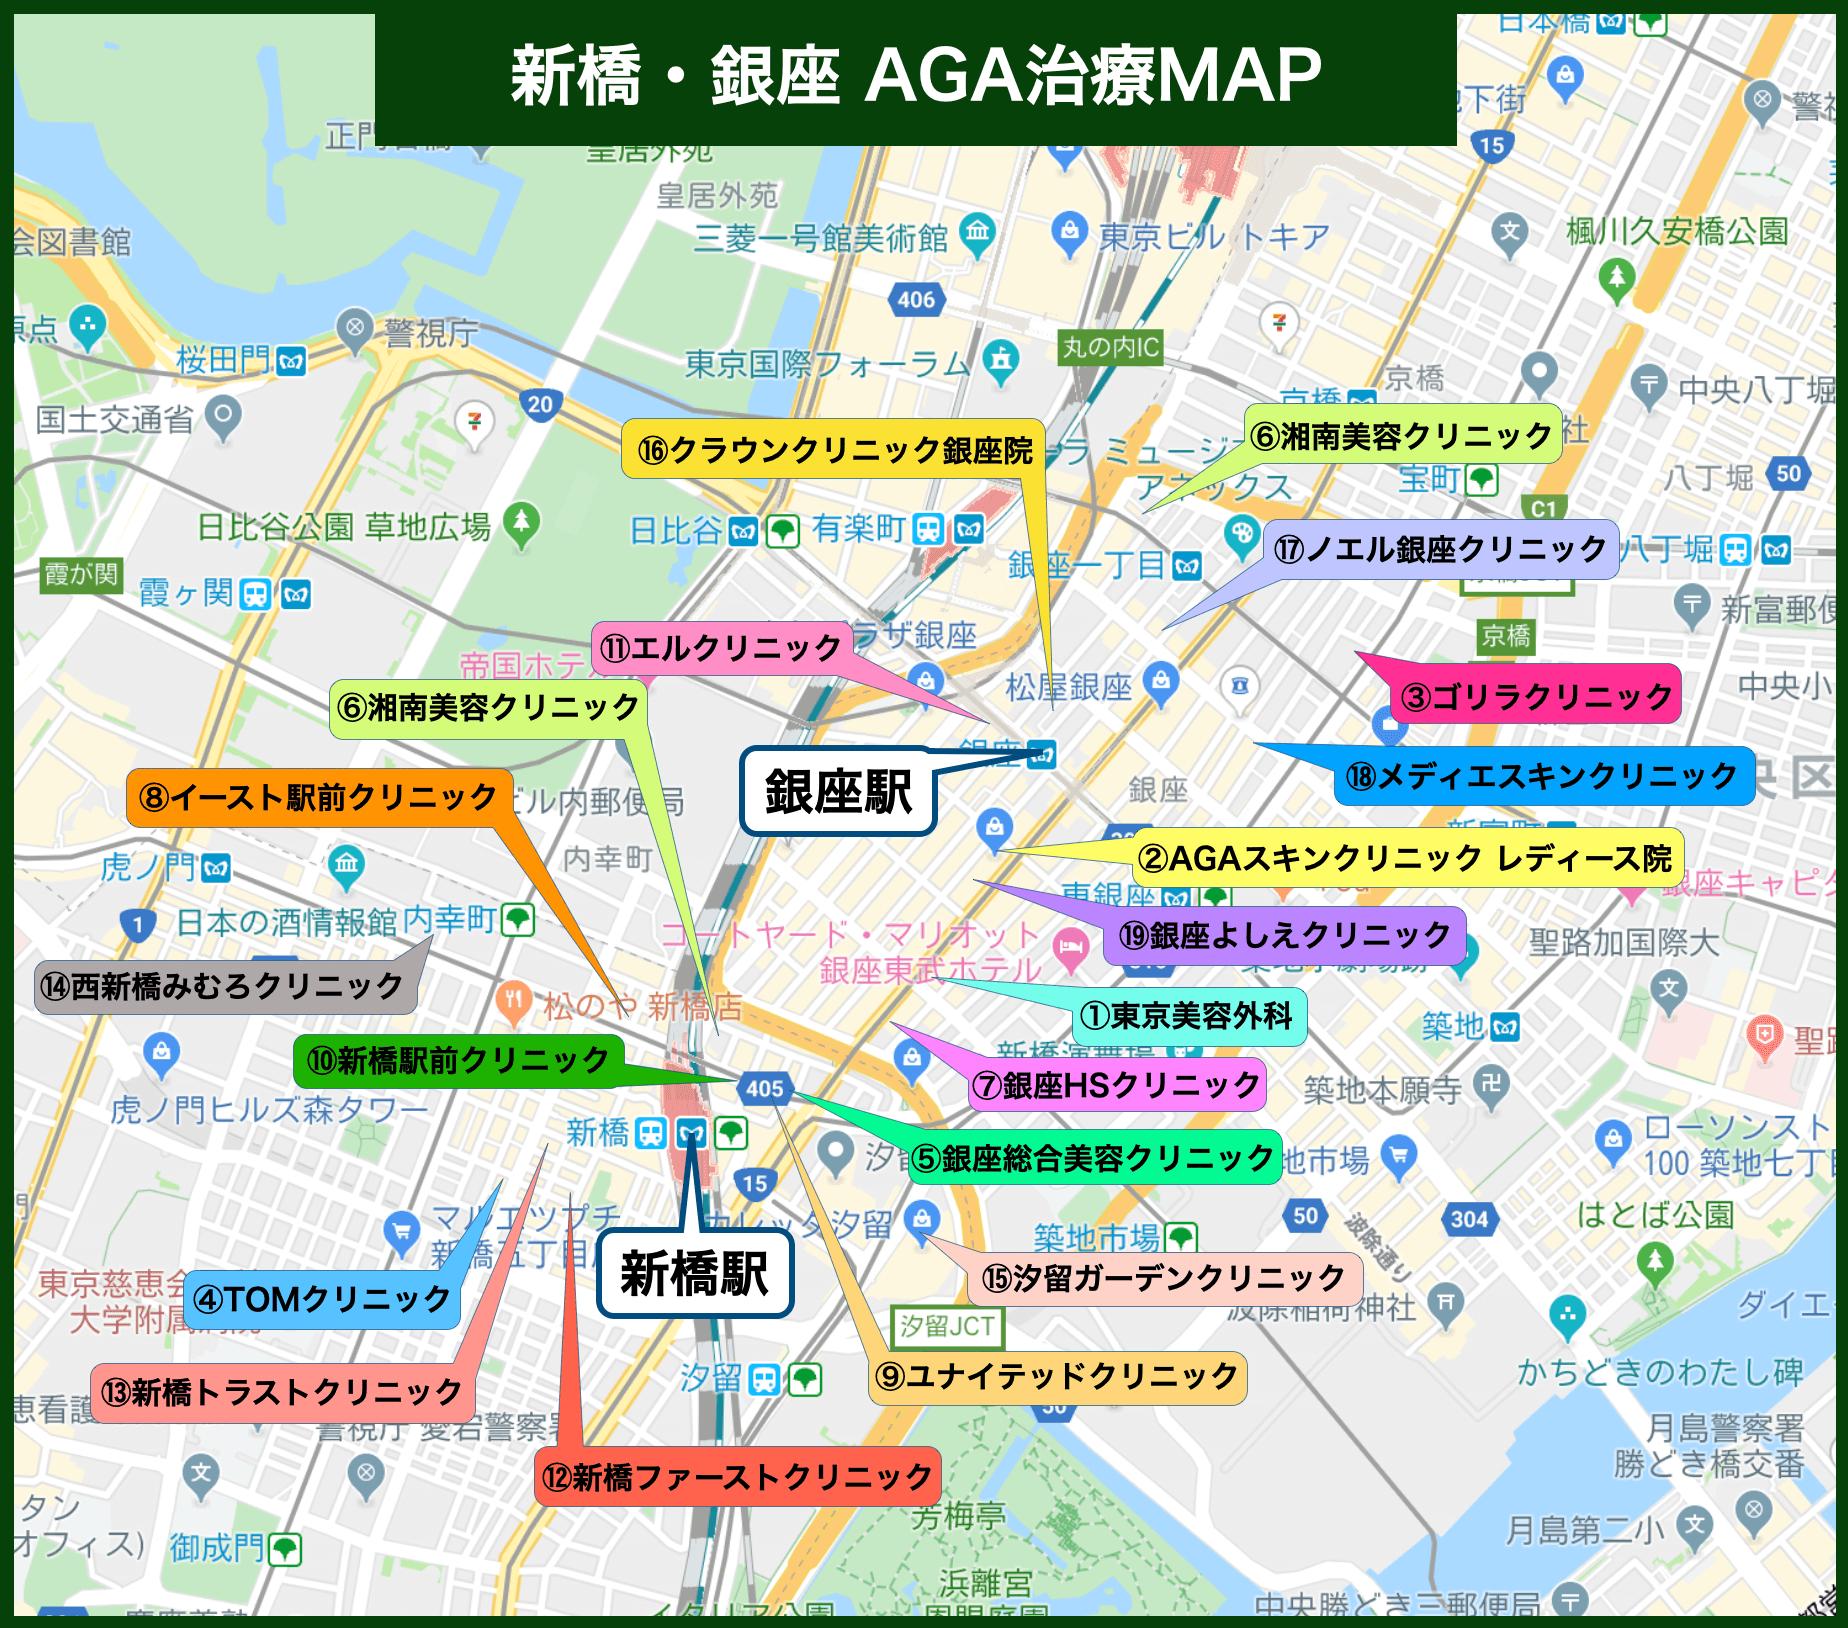 新橋・銀座 AGA治療MAP